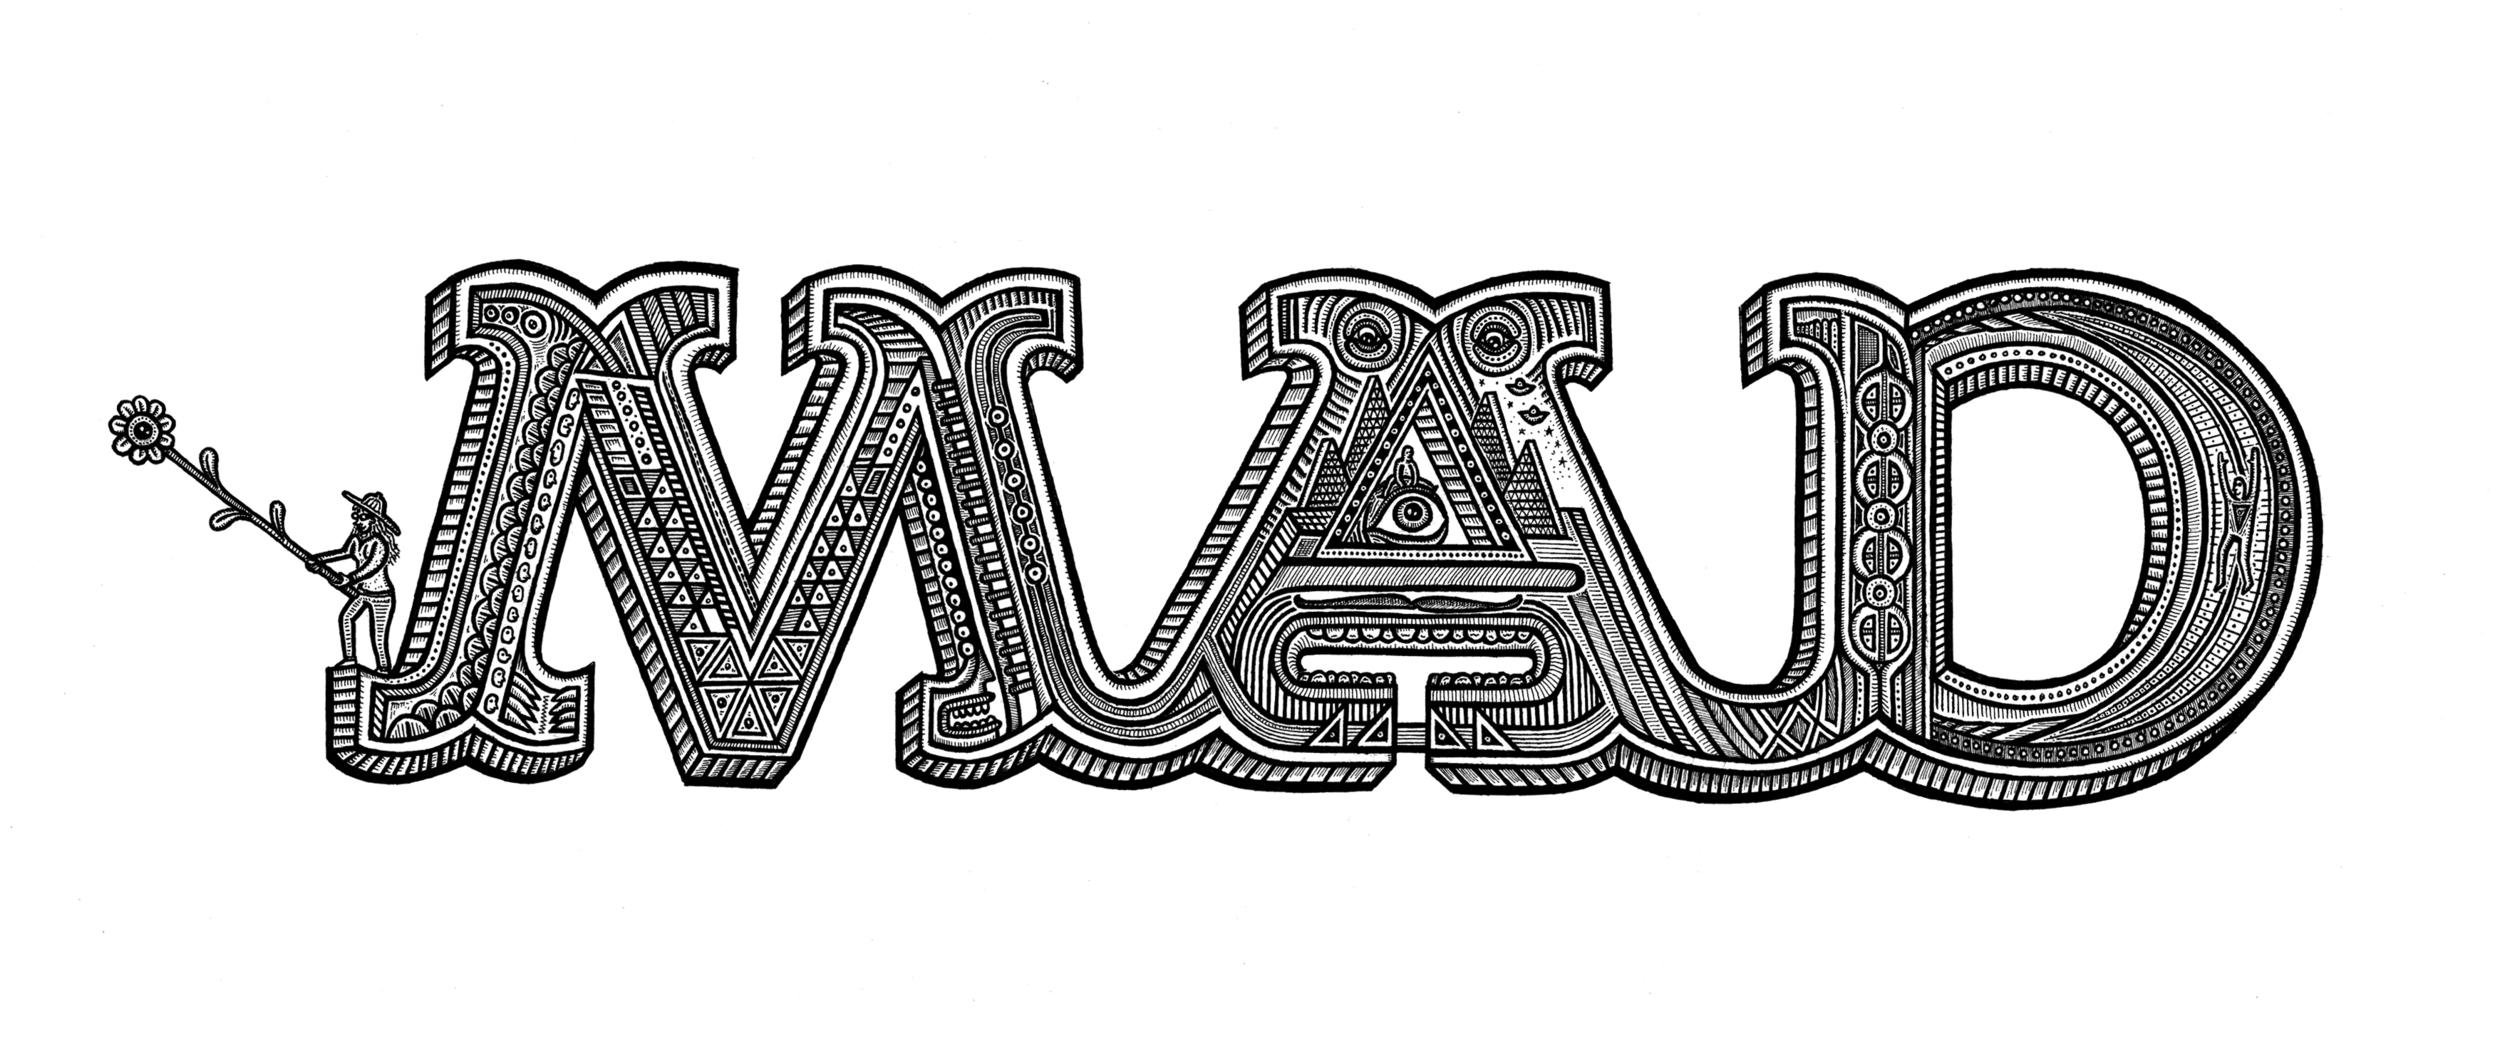 'The M.A.D Logo'